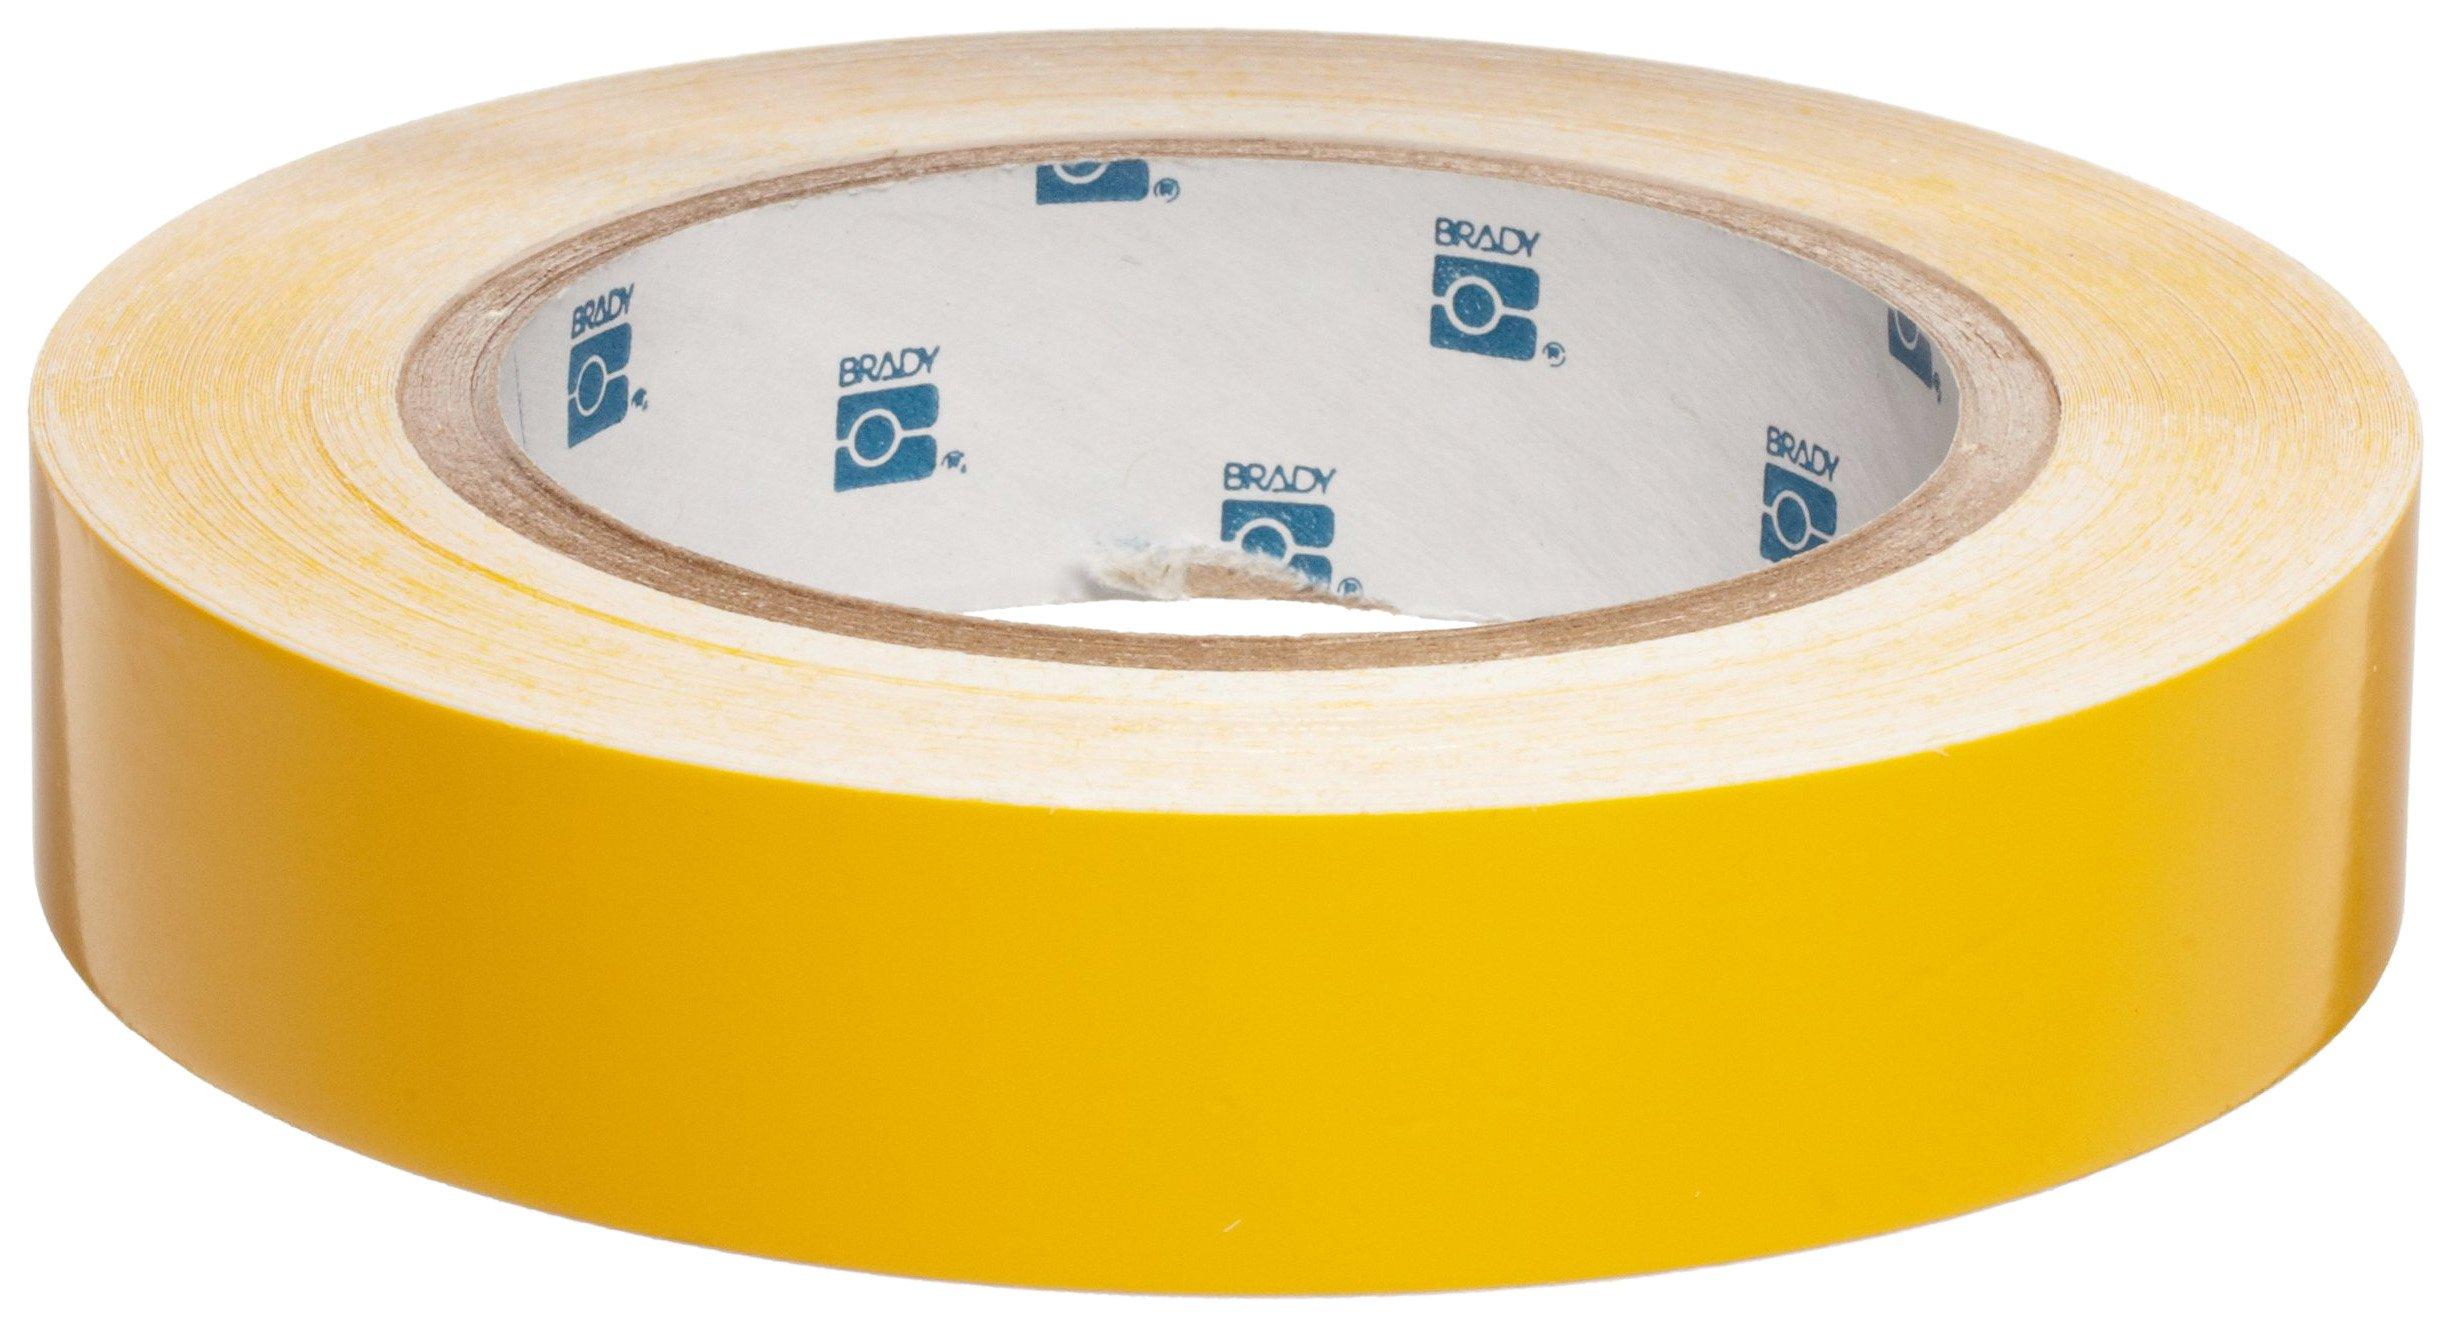 Brady 36301 90' Length, 1'' Width, B-946 High Performance Vinyl, Yellow Color Pipe Banding Tape